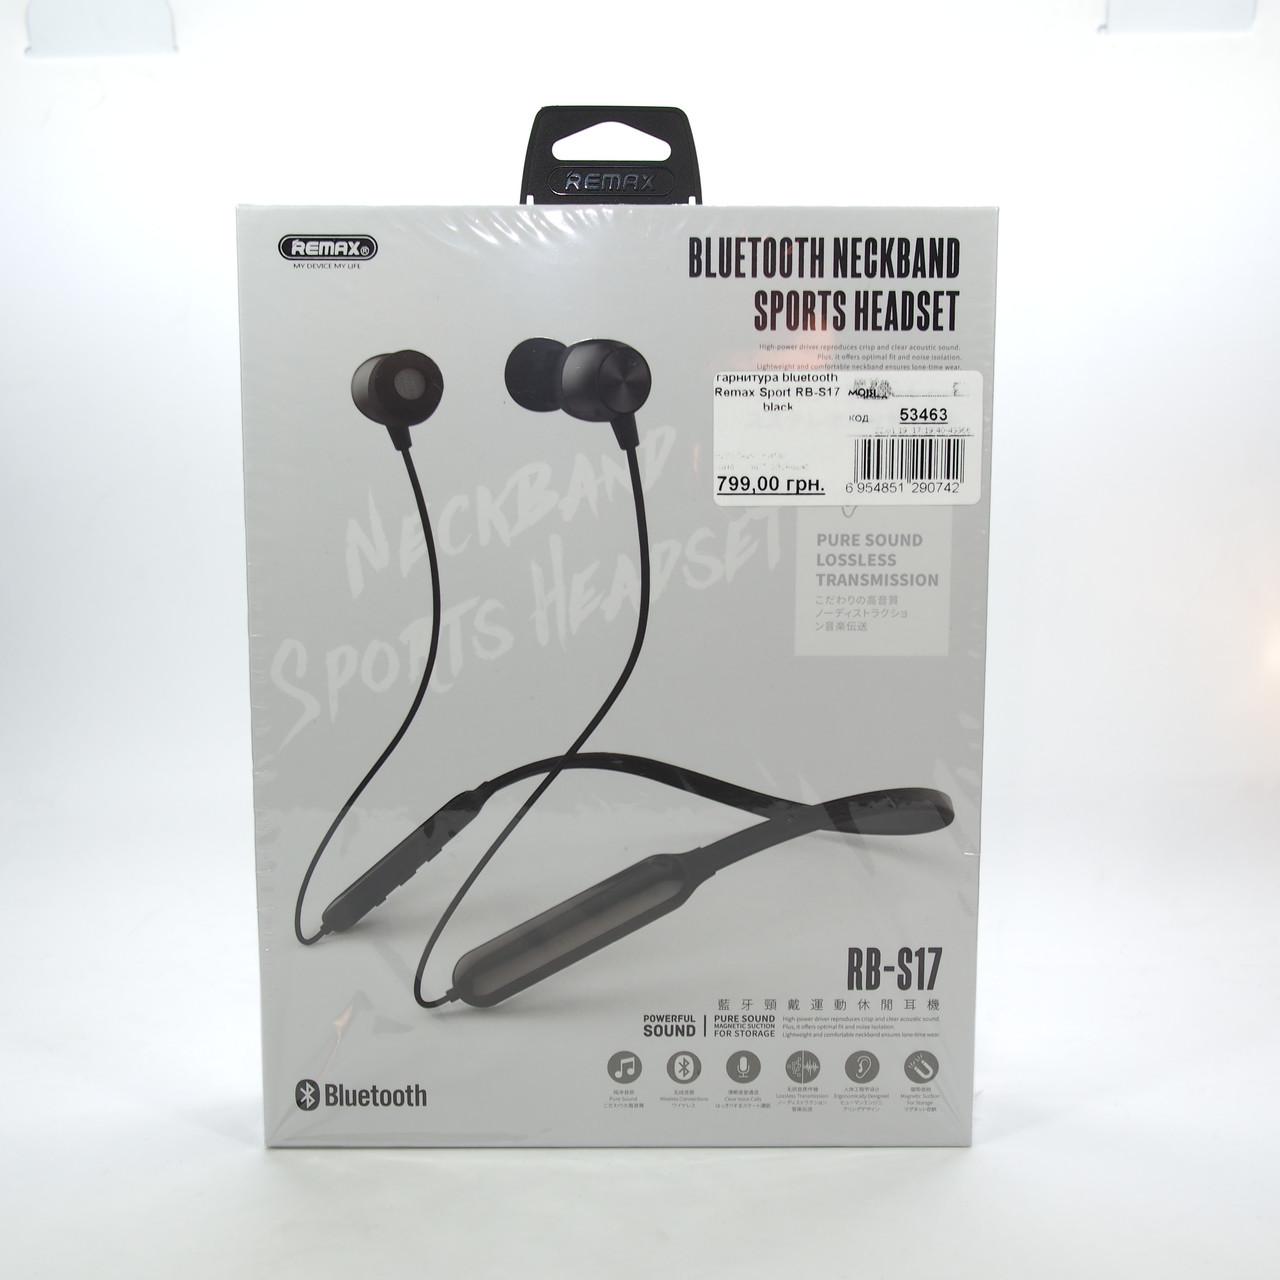 Гарнитура bluetooth Remax Sport RB-S17 black (RB-S17BK) EAN/UPC: 6954851290742